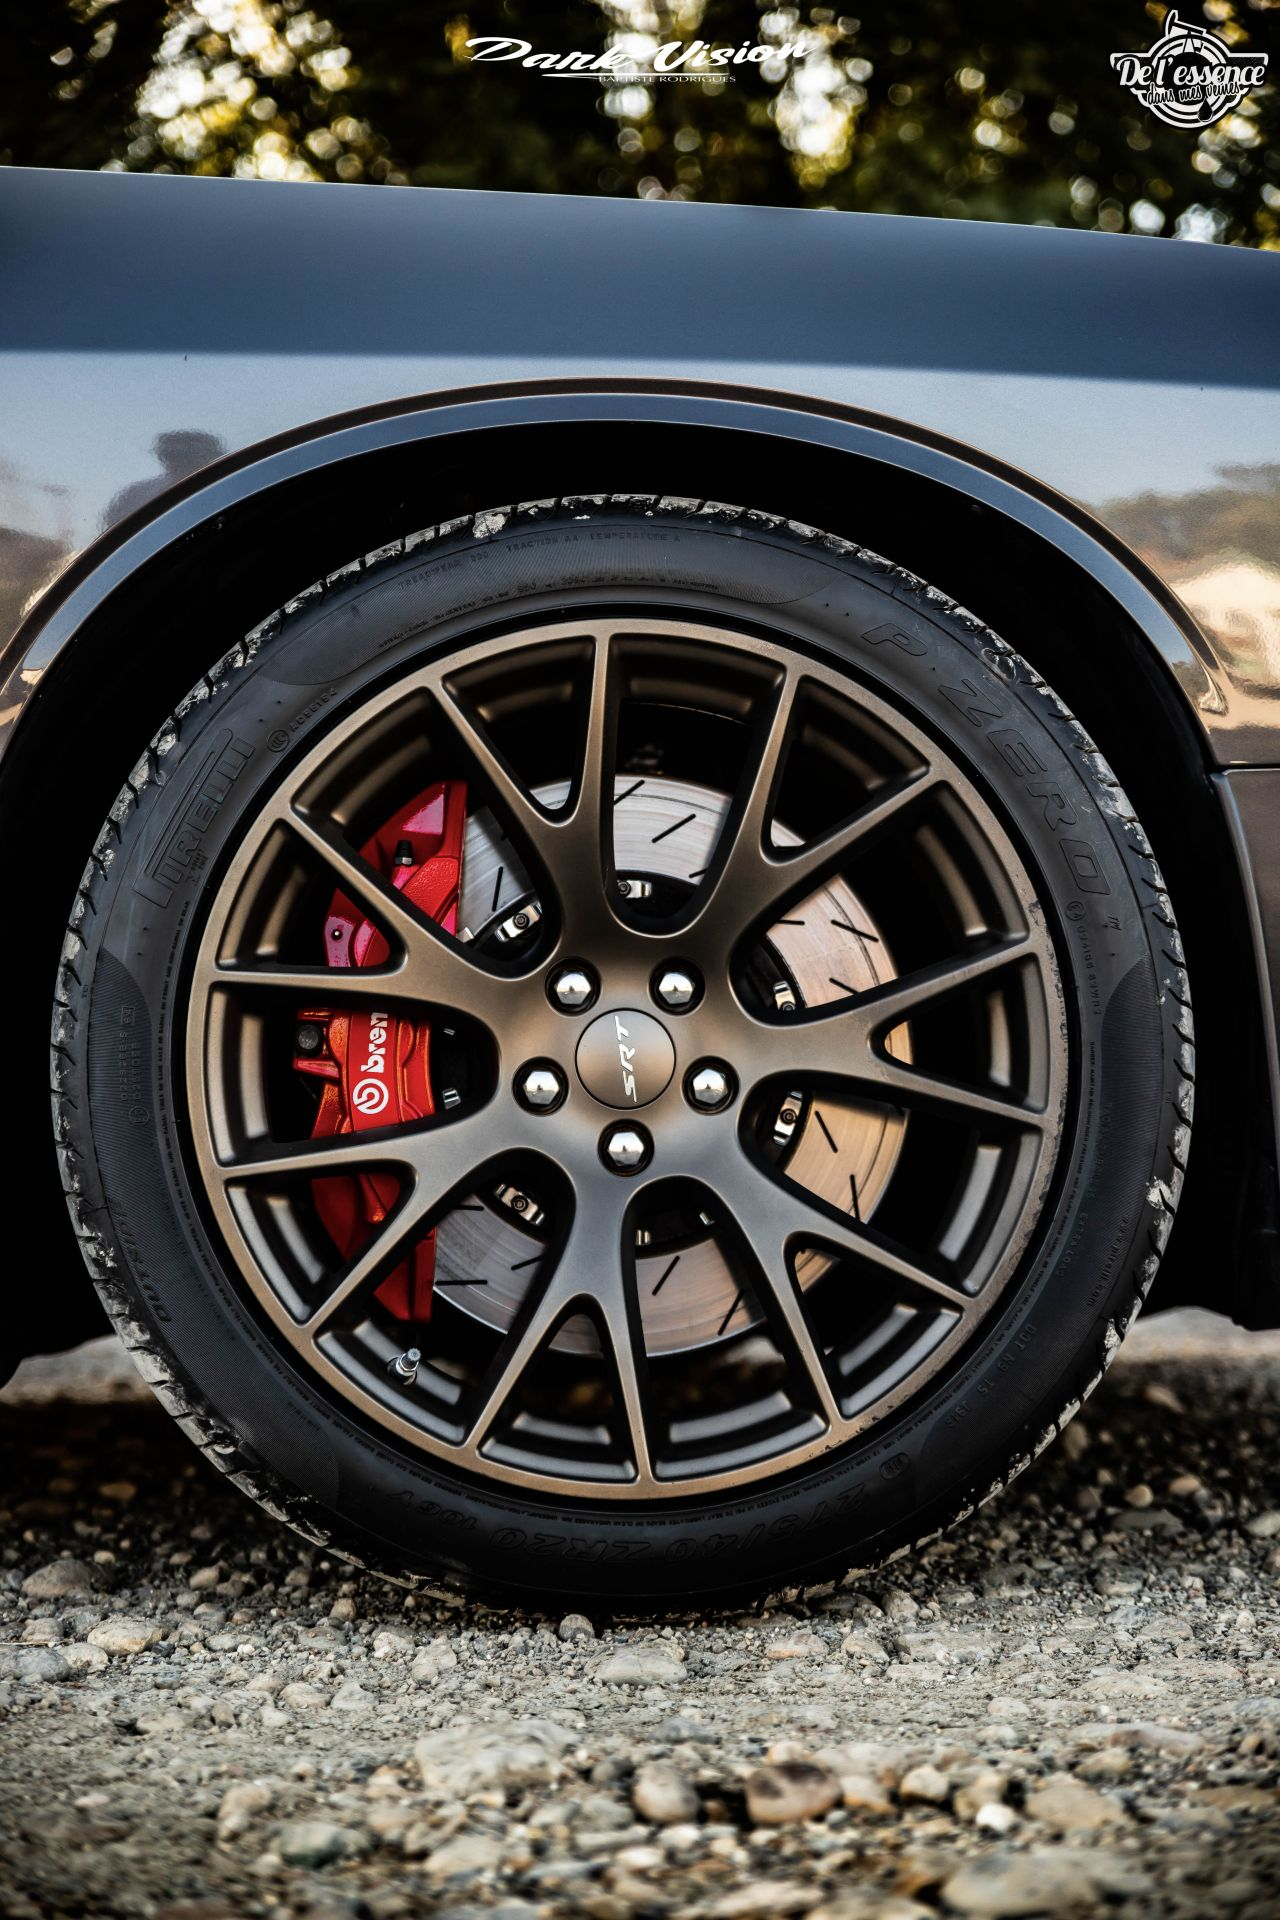 Dodge Challenger Hellcat de 2016 - Elle vous met des beignes ! 26